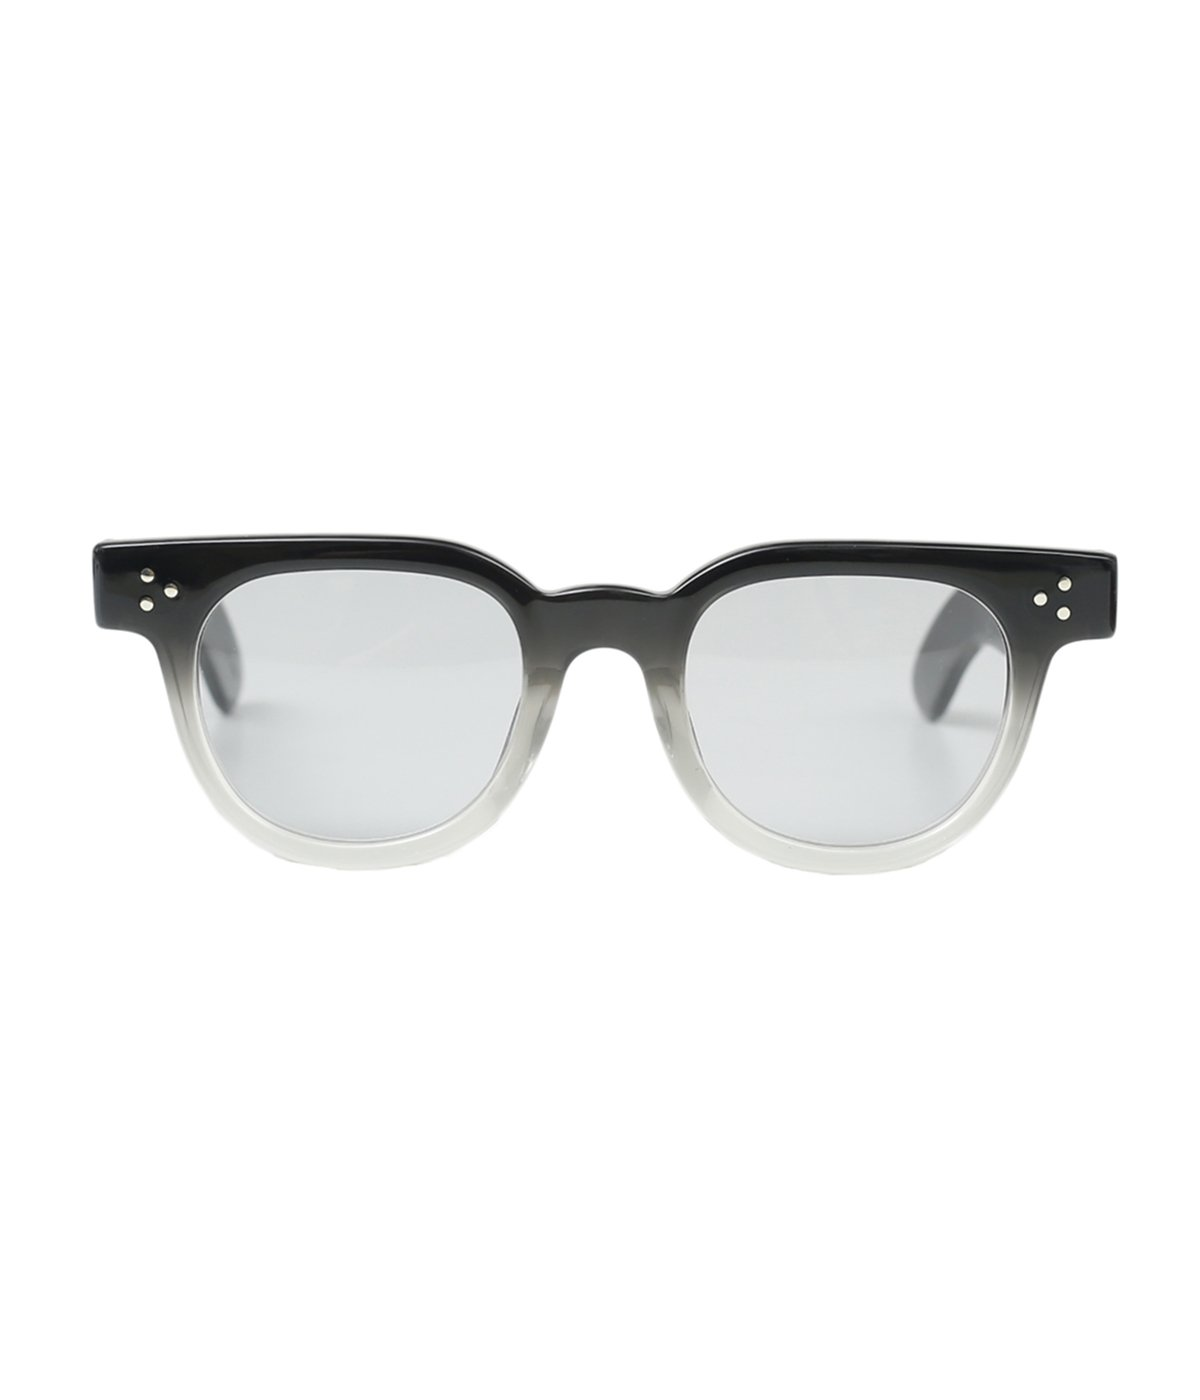 FDR 46-22 - Black Clear Fade / GR-56 -